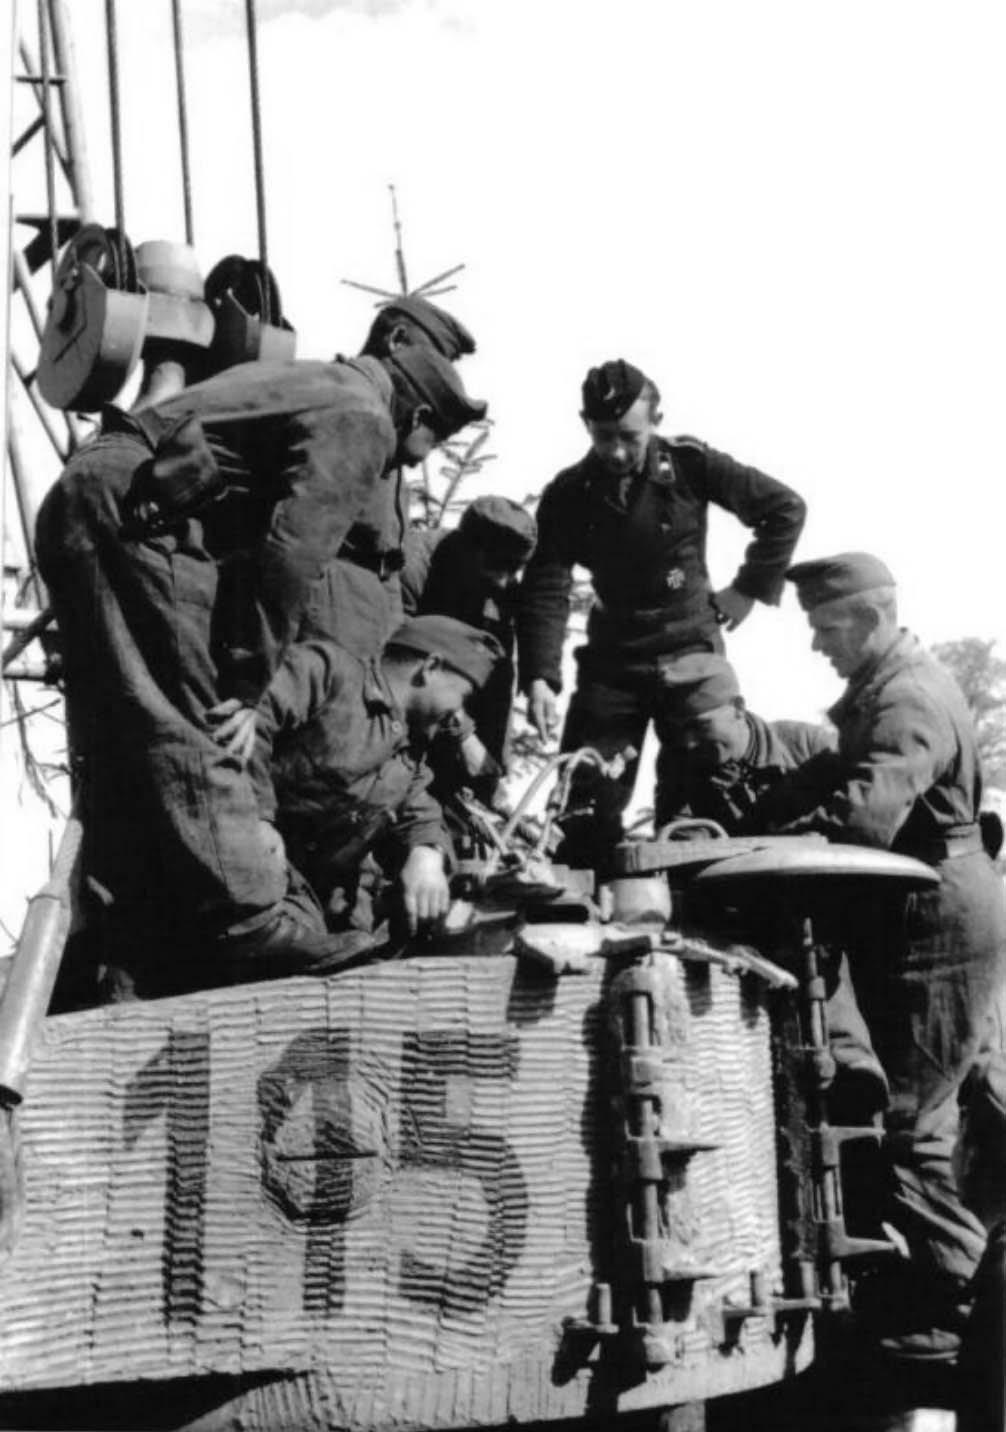 Diverses photos de la WWII - Page 37 57311